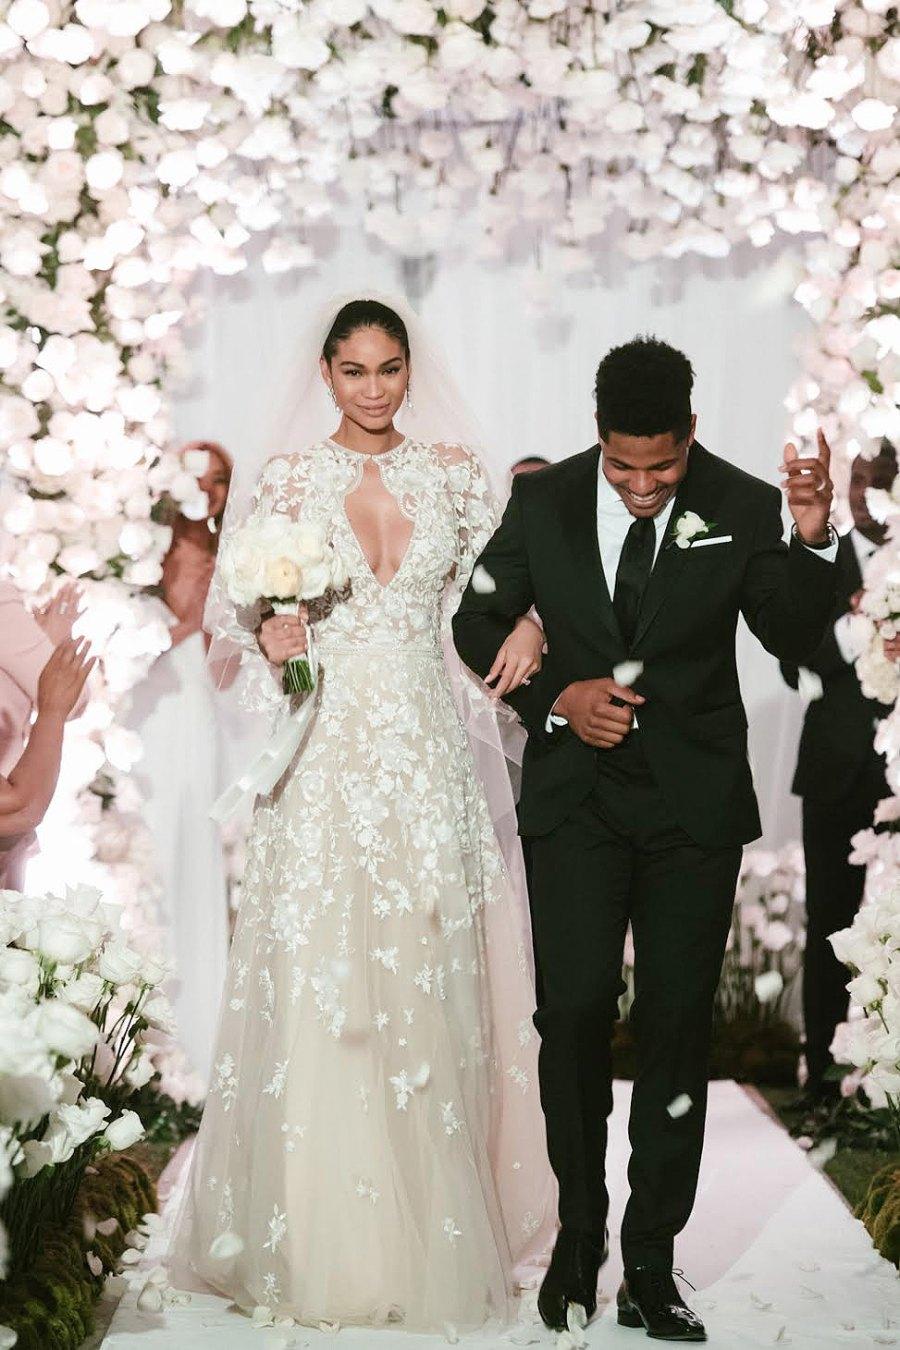 Chanel Iman, Sterling Shepard, Wedding